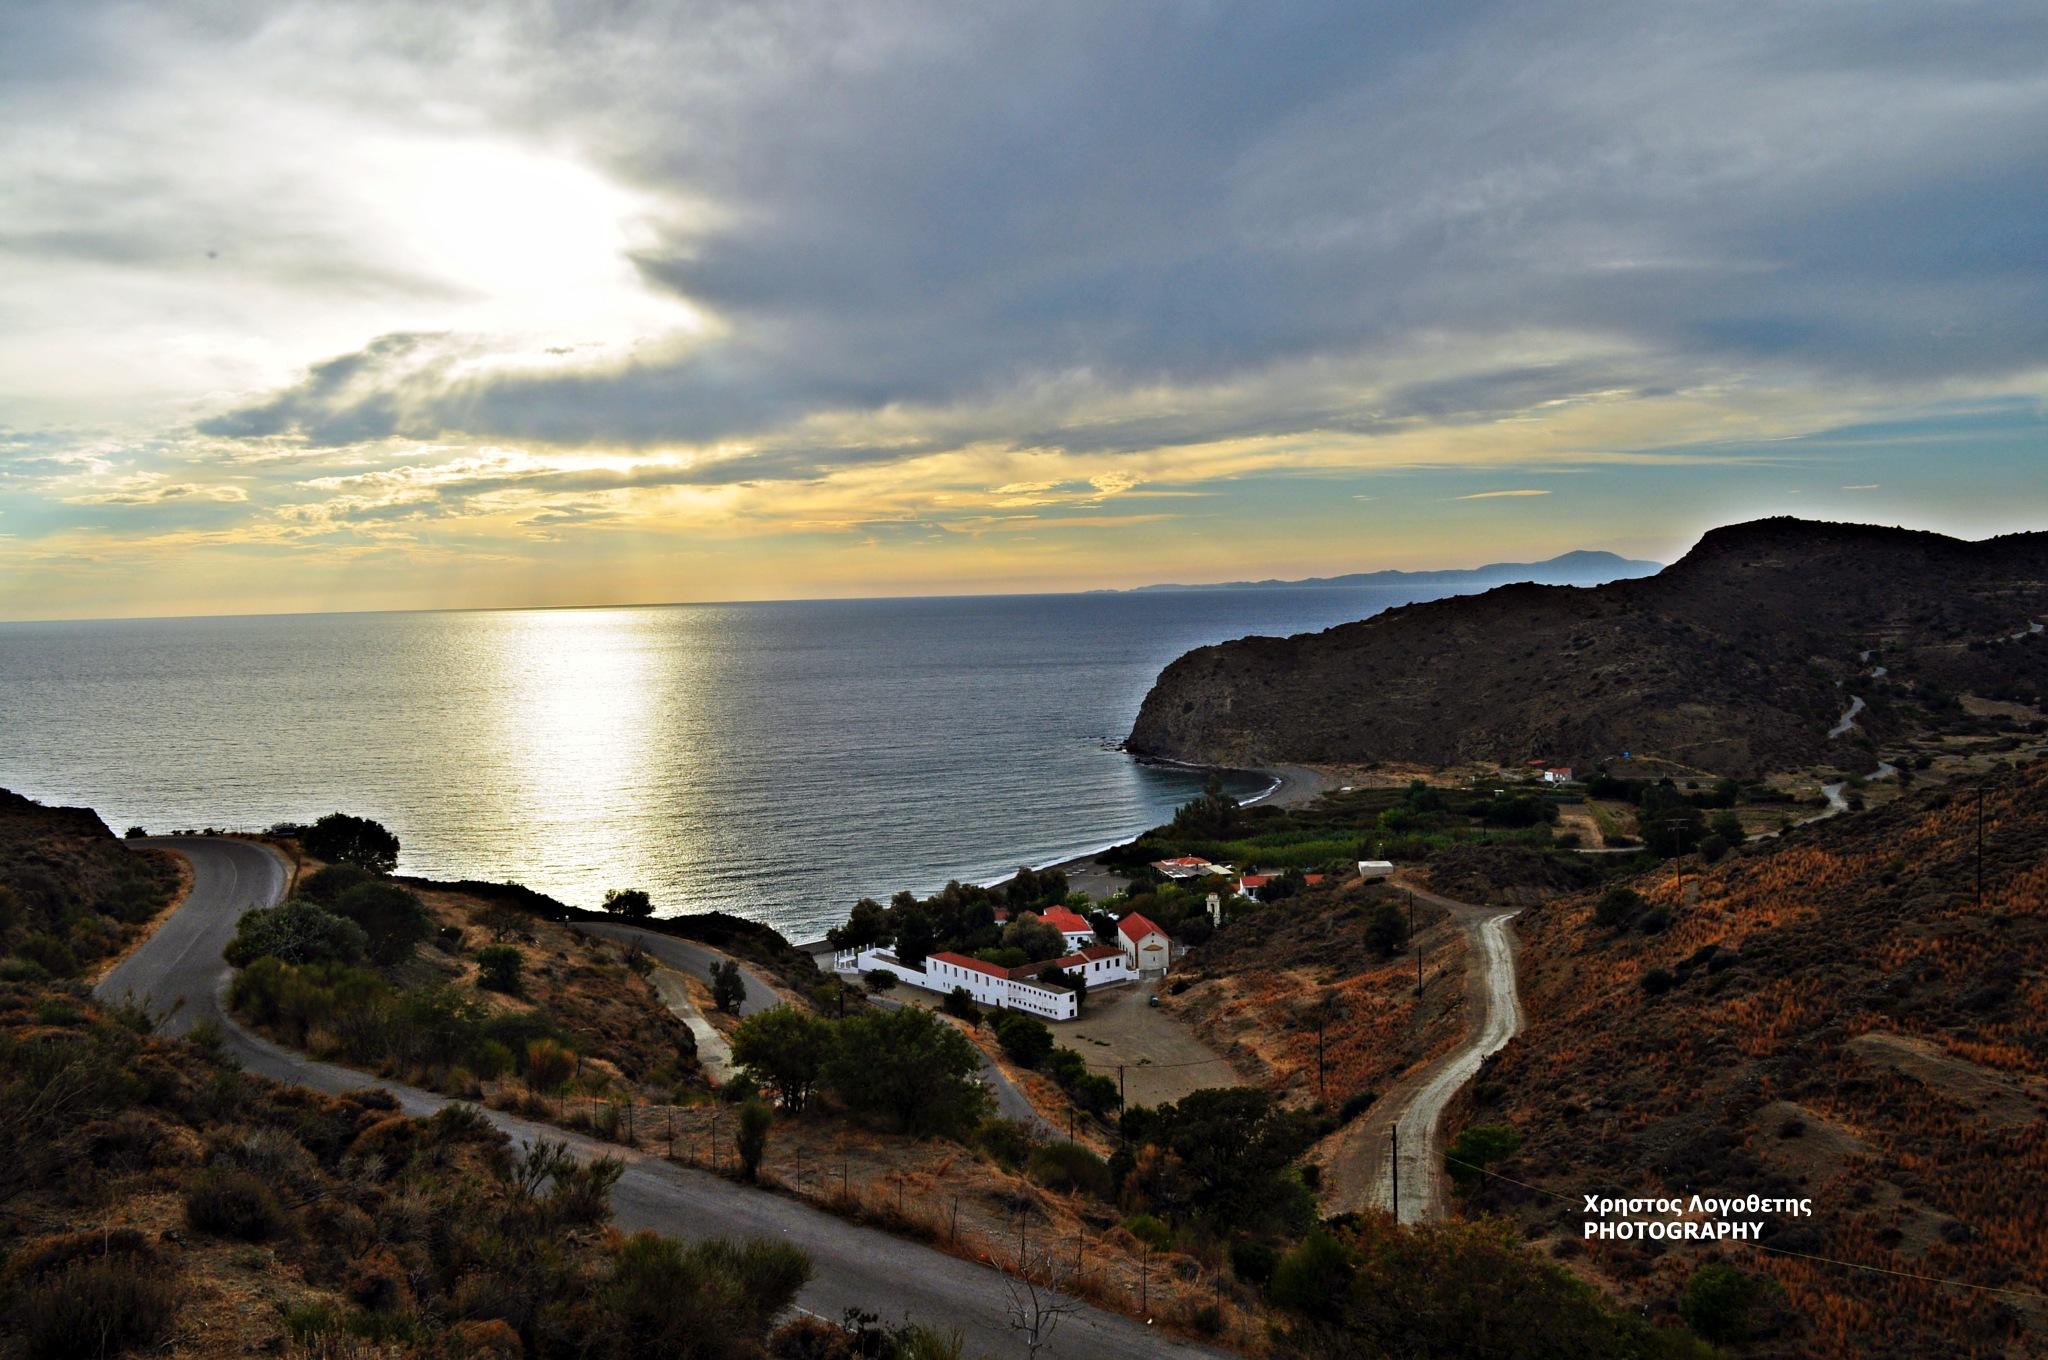 Greece Island Chios (Volissos) by Chris Logothetis